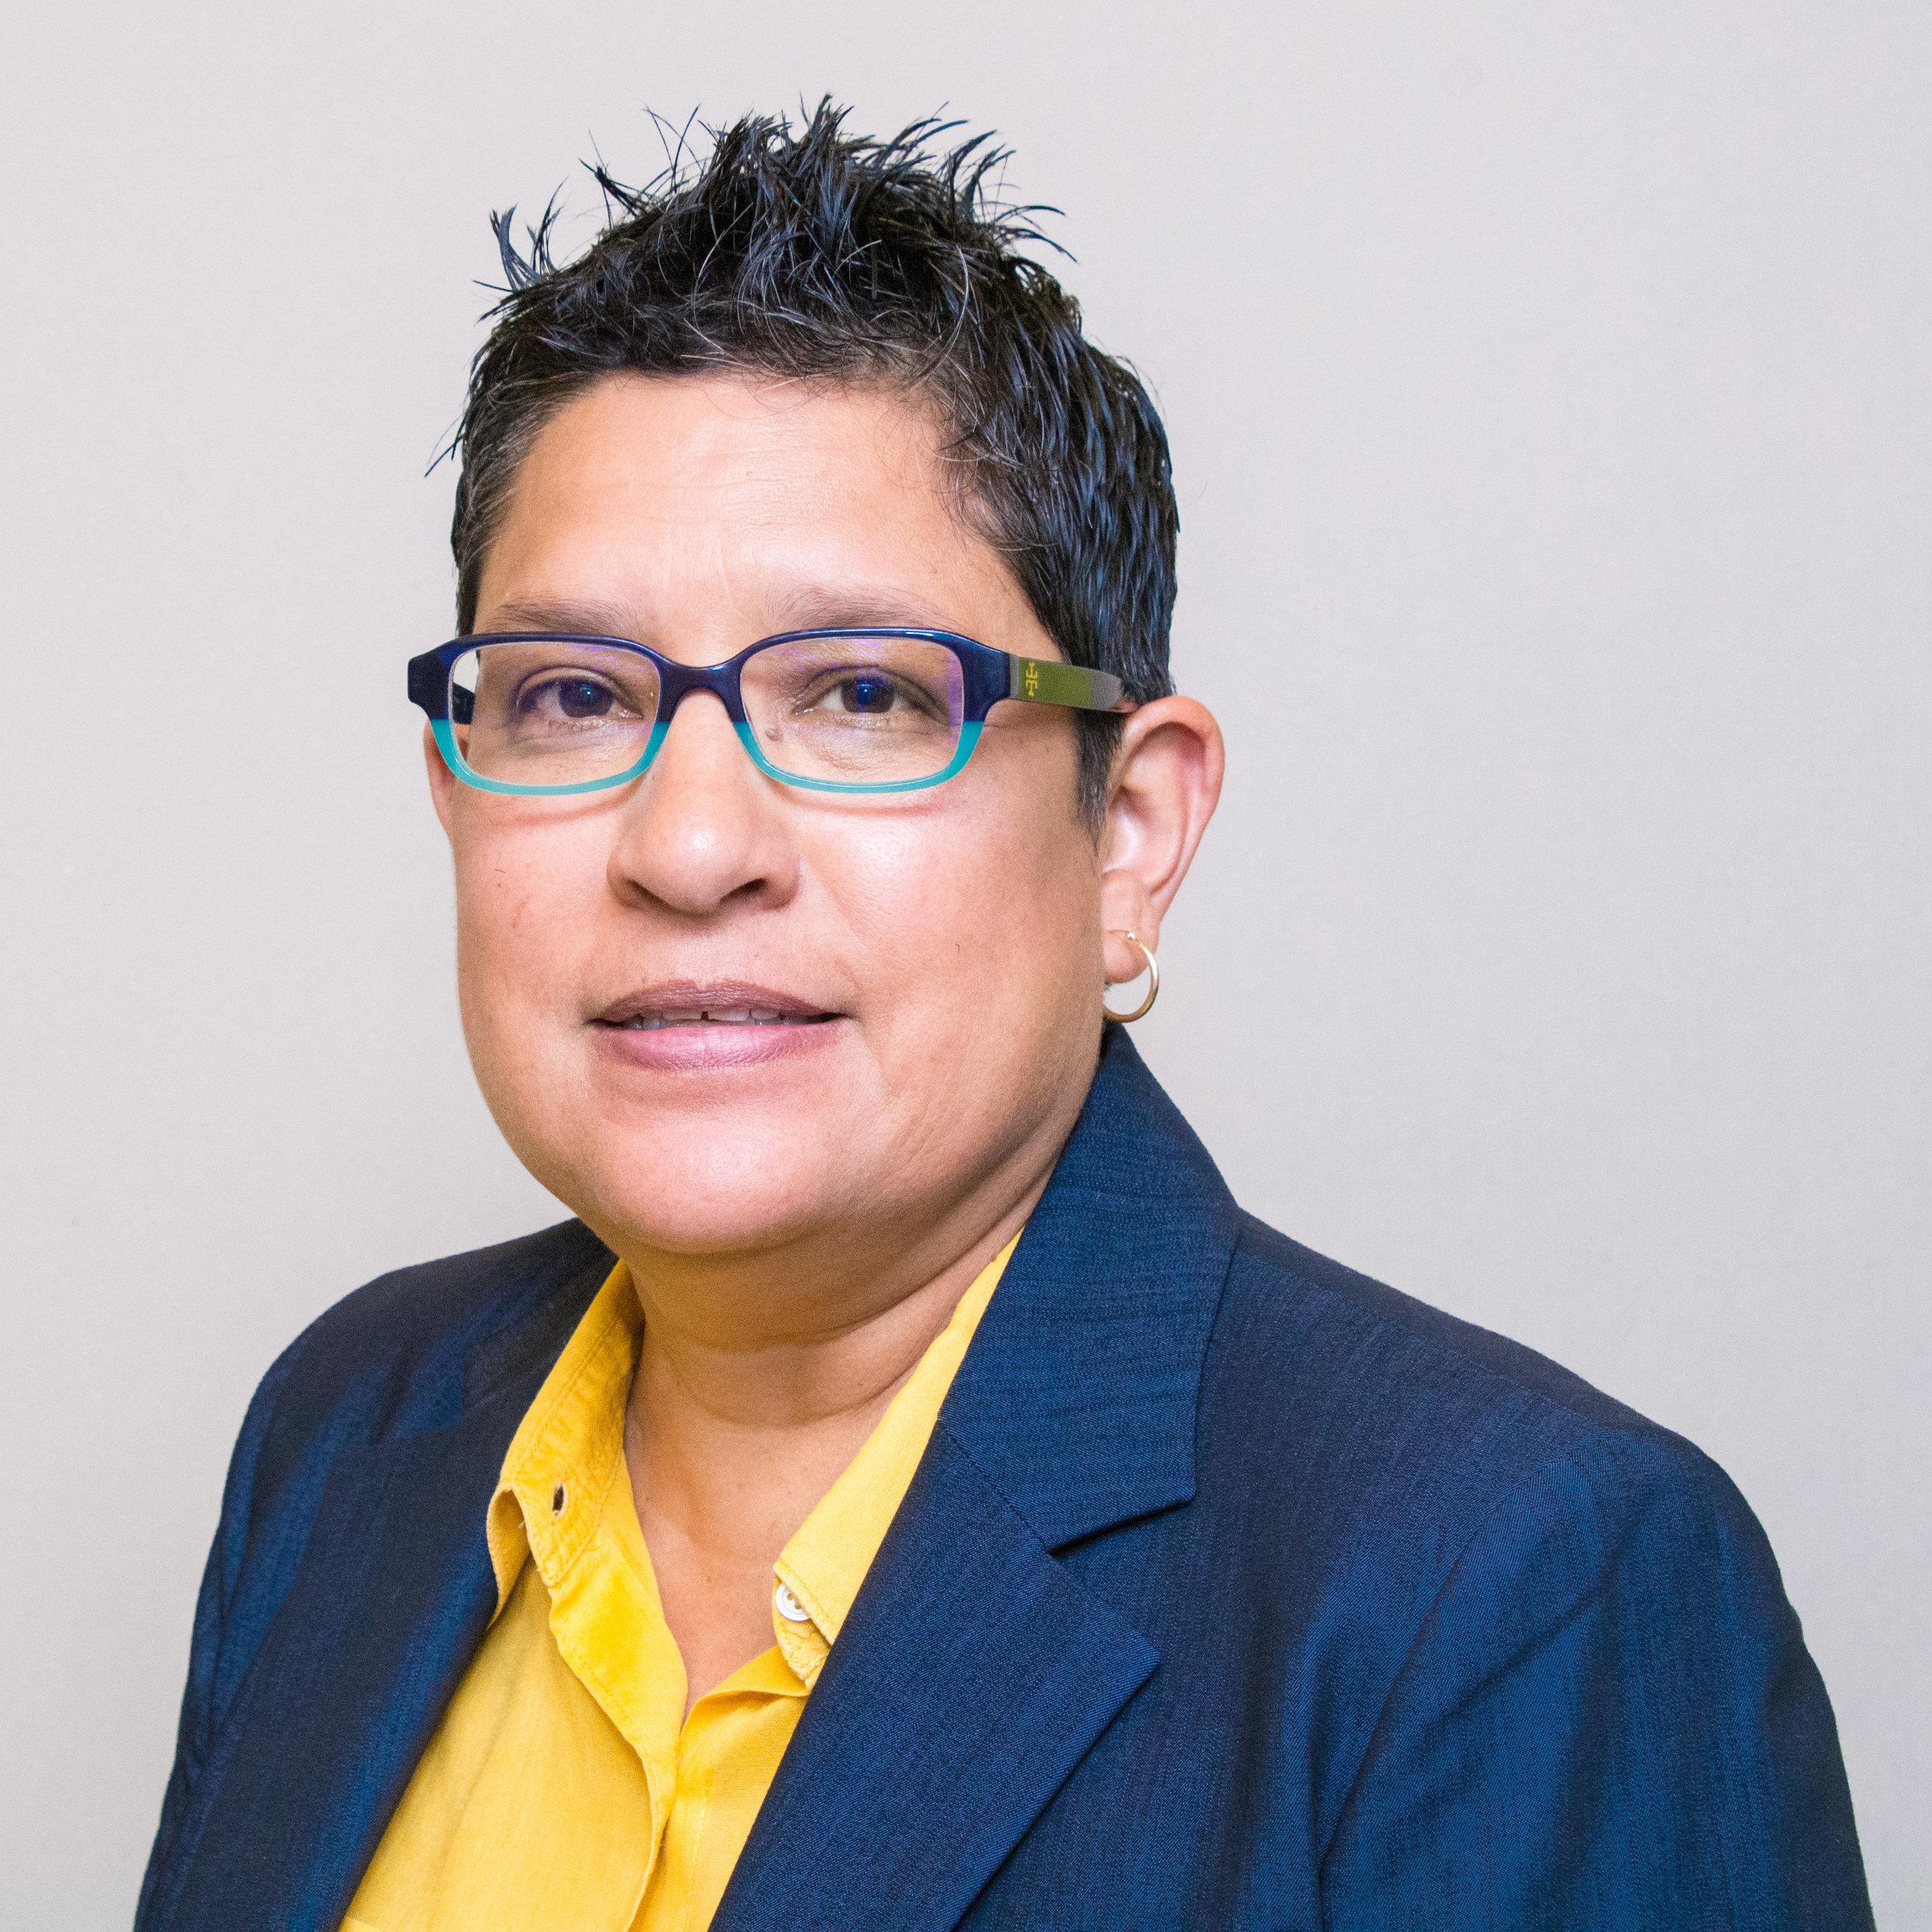 M. Naomi Doyle-Madrid, Executive Director, Crisis Intervention of Houston, Inc.